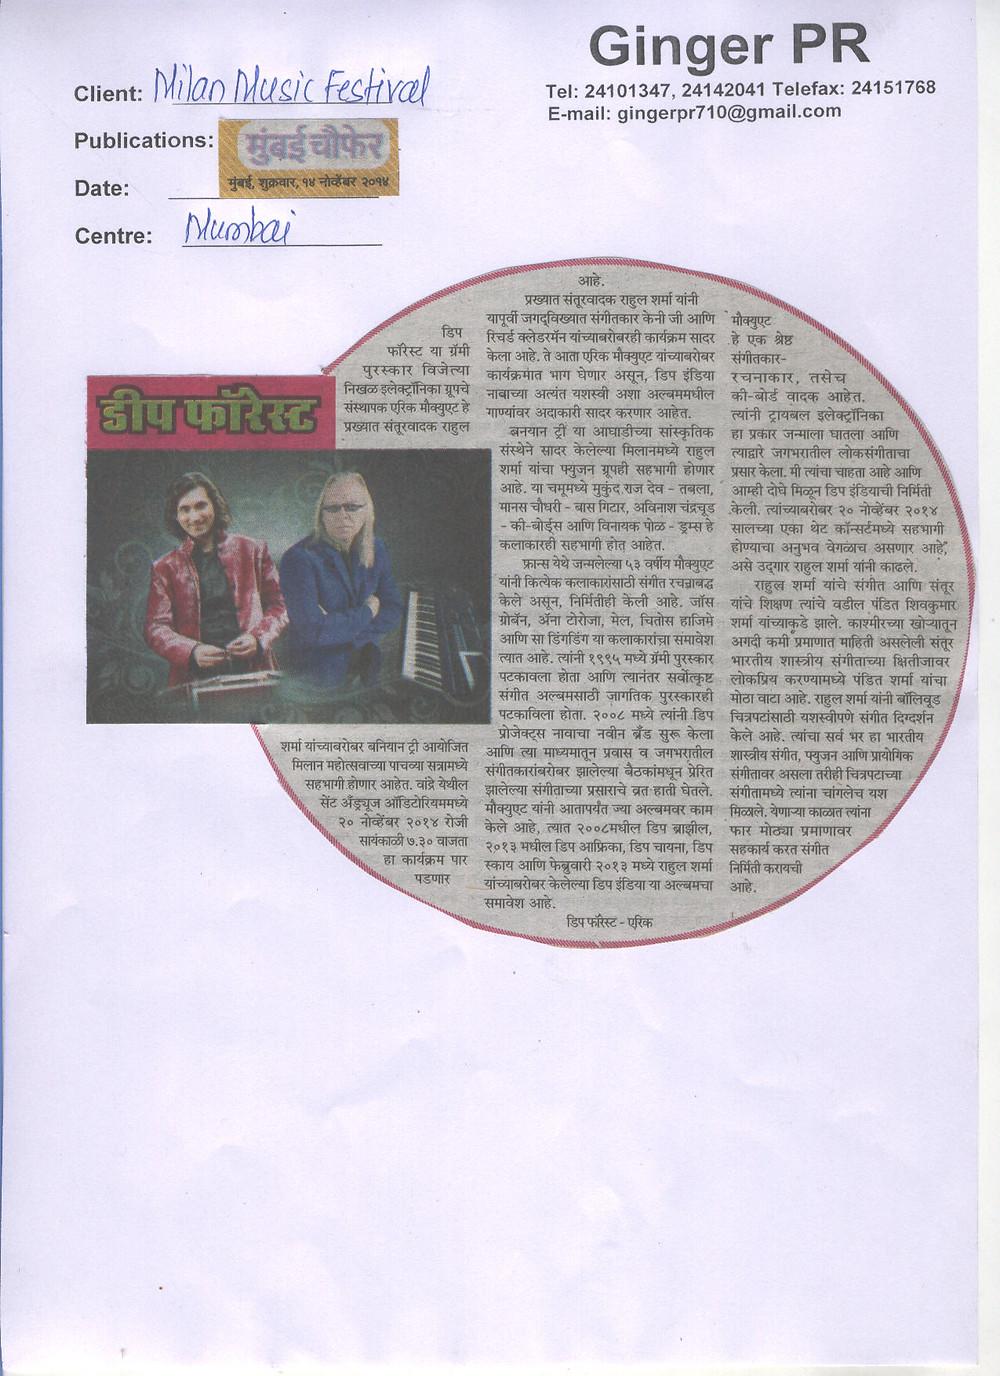 Mumbai Chaufer 14.11.2014 ( Milan Music Festival).jpg